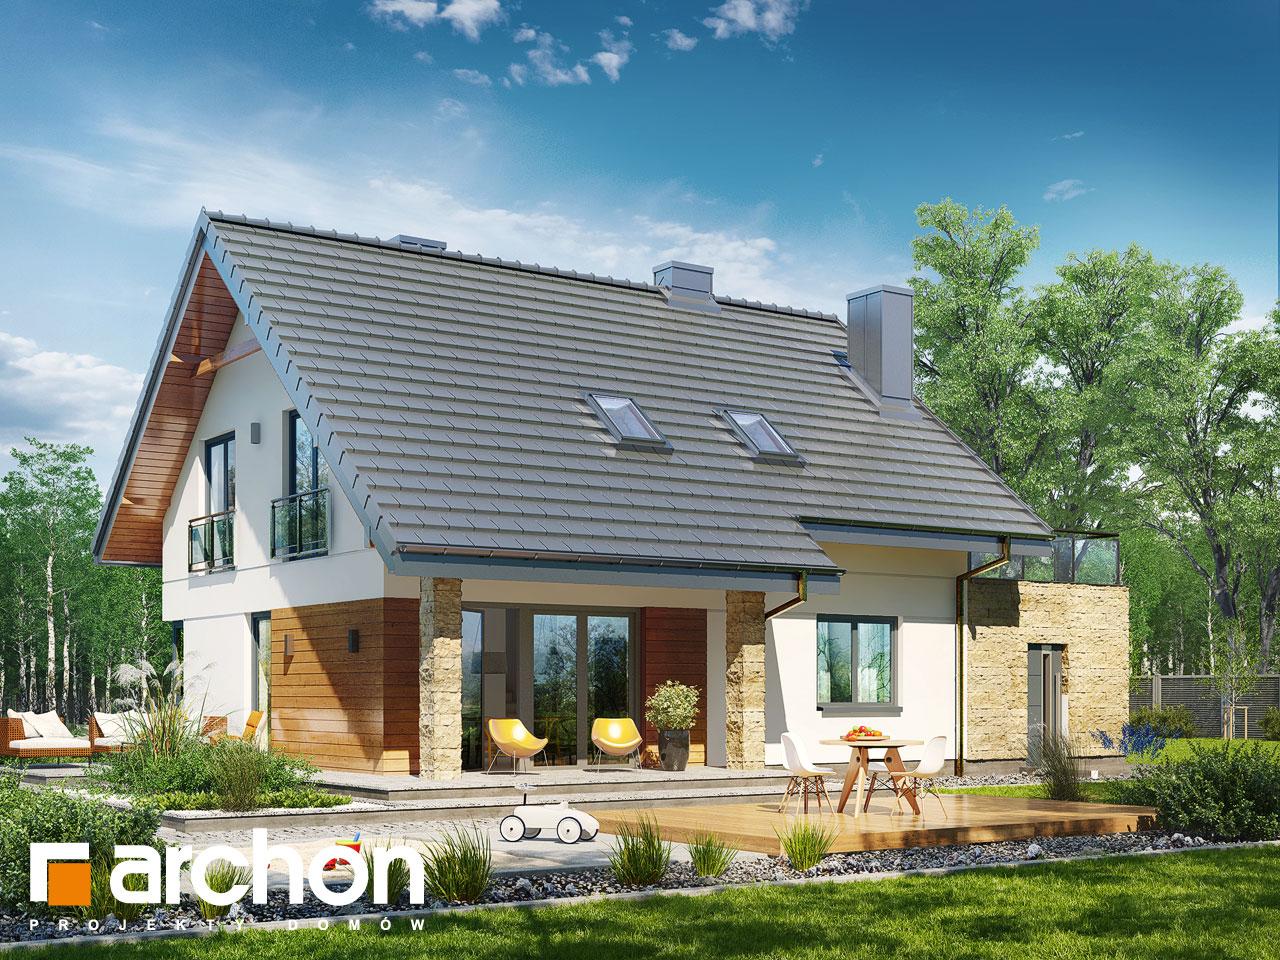 projekt domu dom w malin wkach g archon. Black Bedroom Furniture Sets. Home Design Ideas